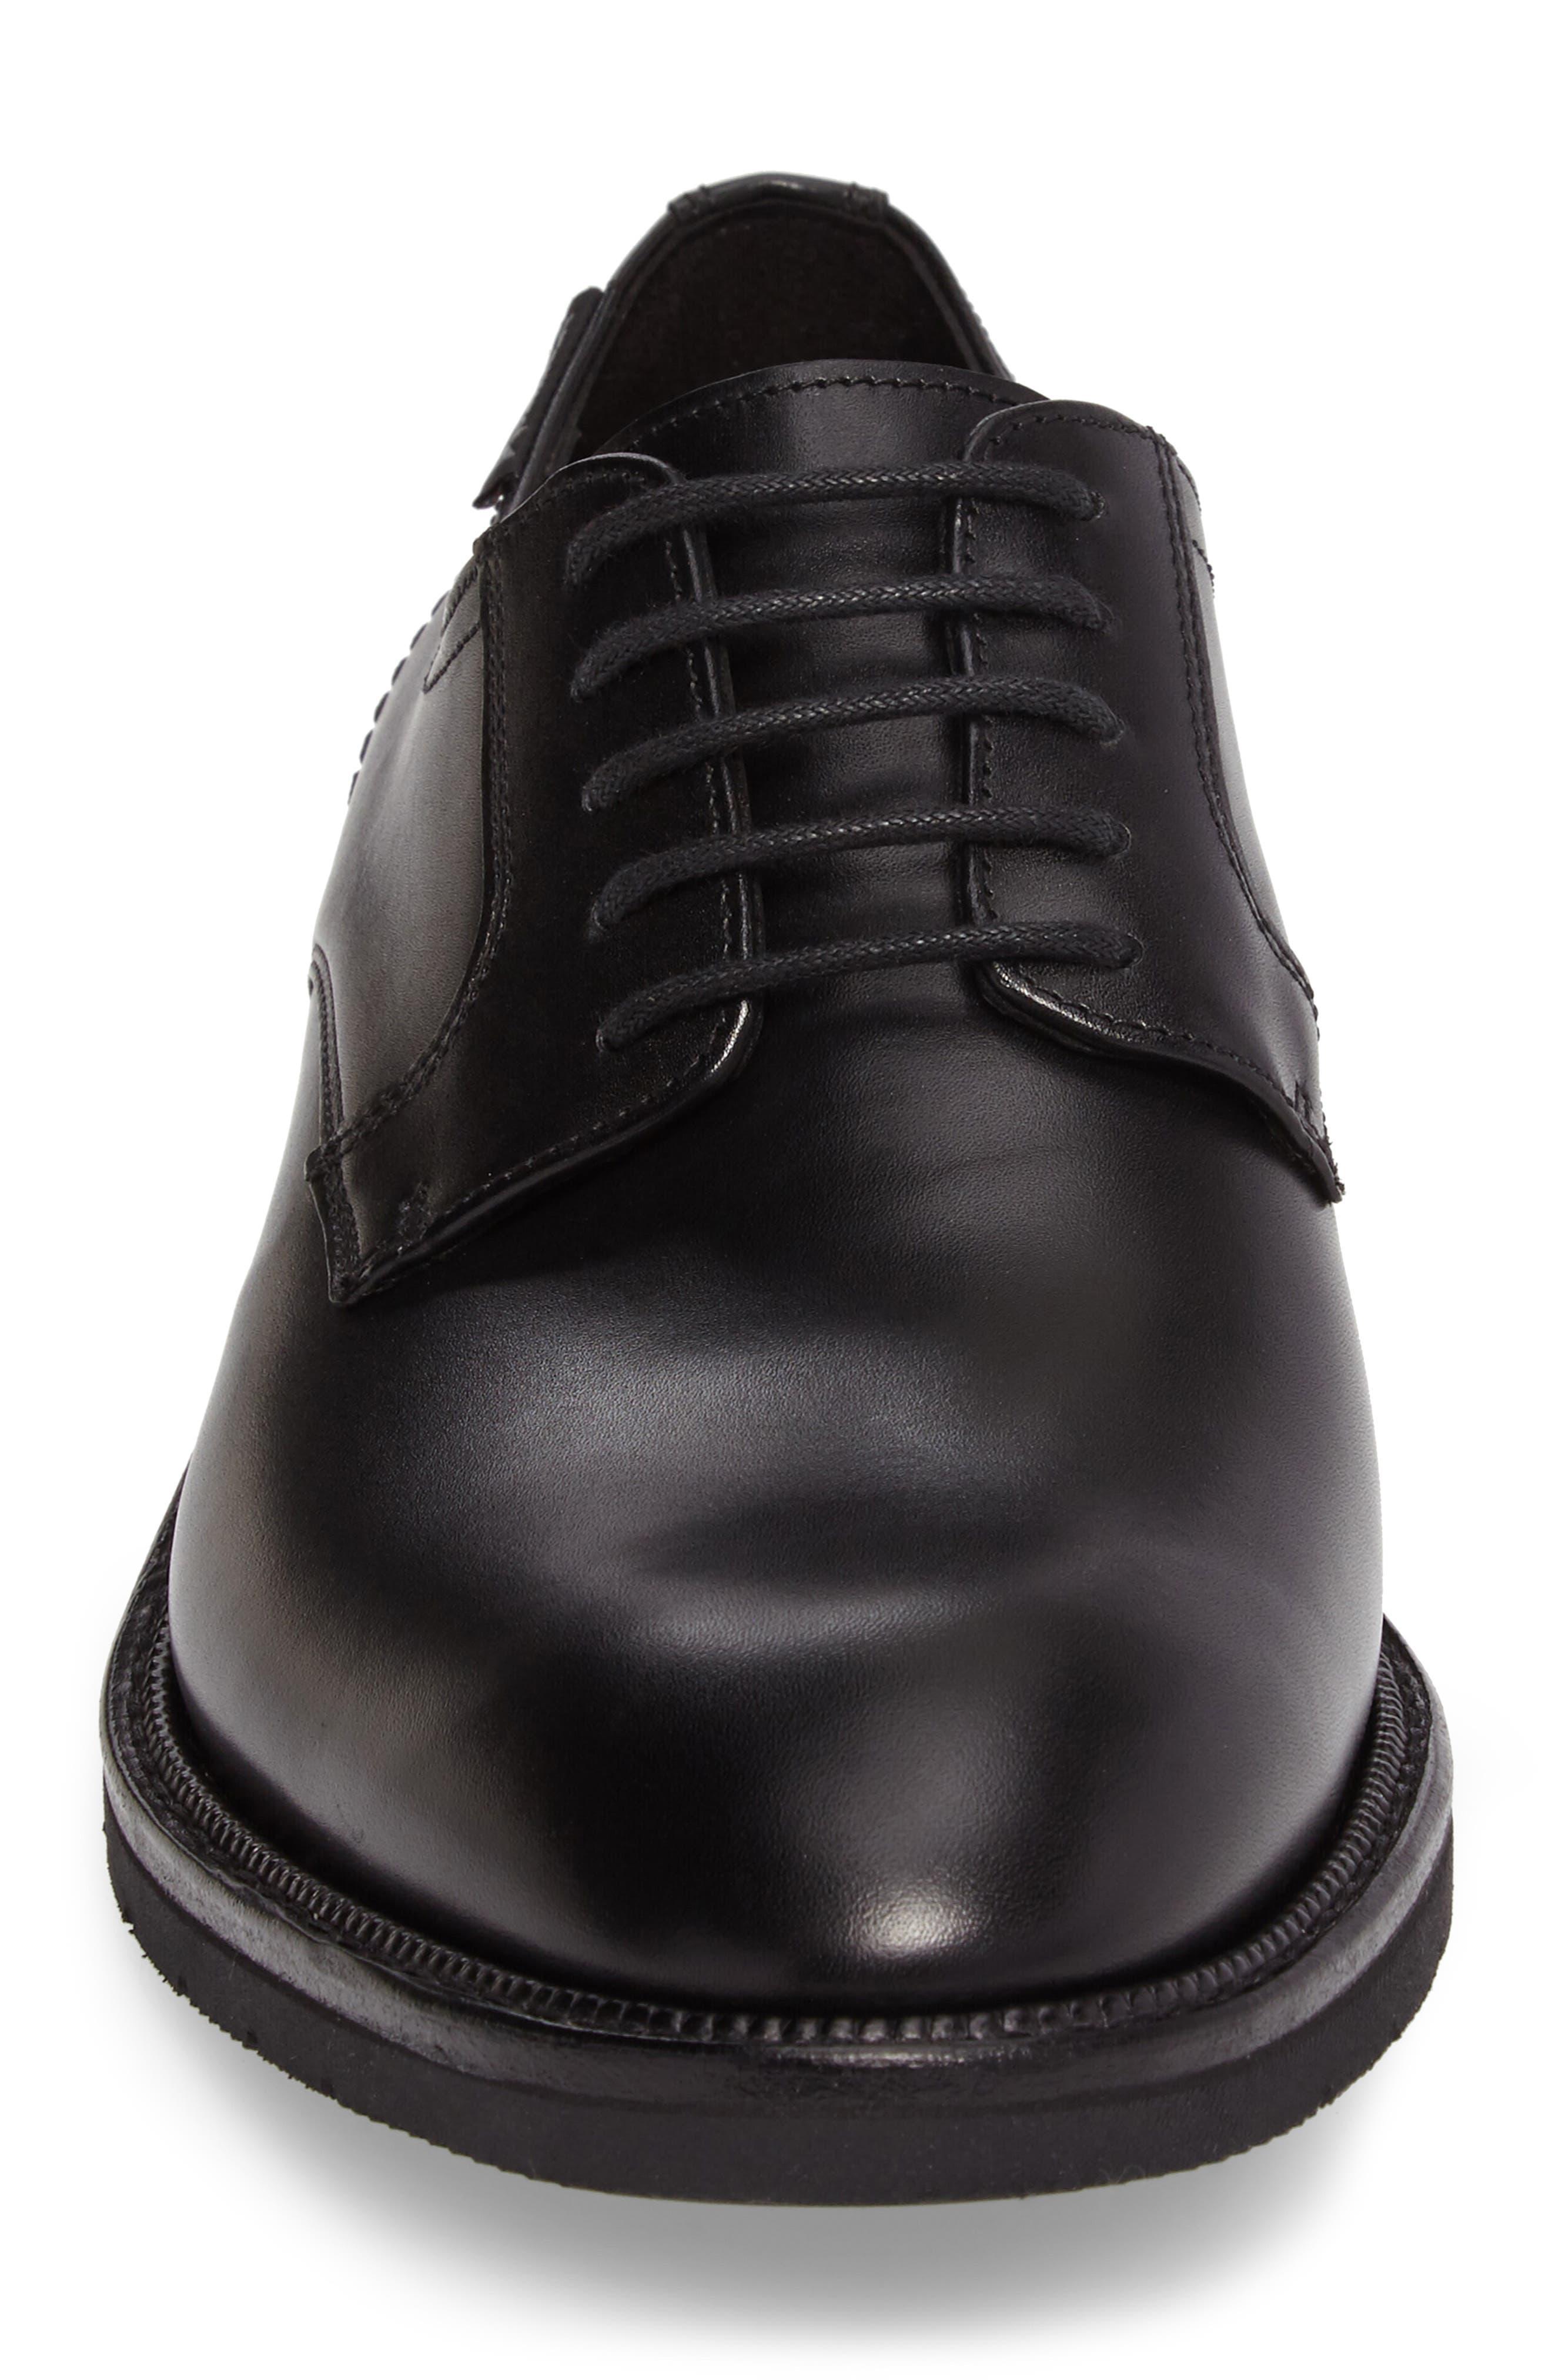 Taylor Plain Toe Derby,                             Alternate thumbnail 4, color,                             Black